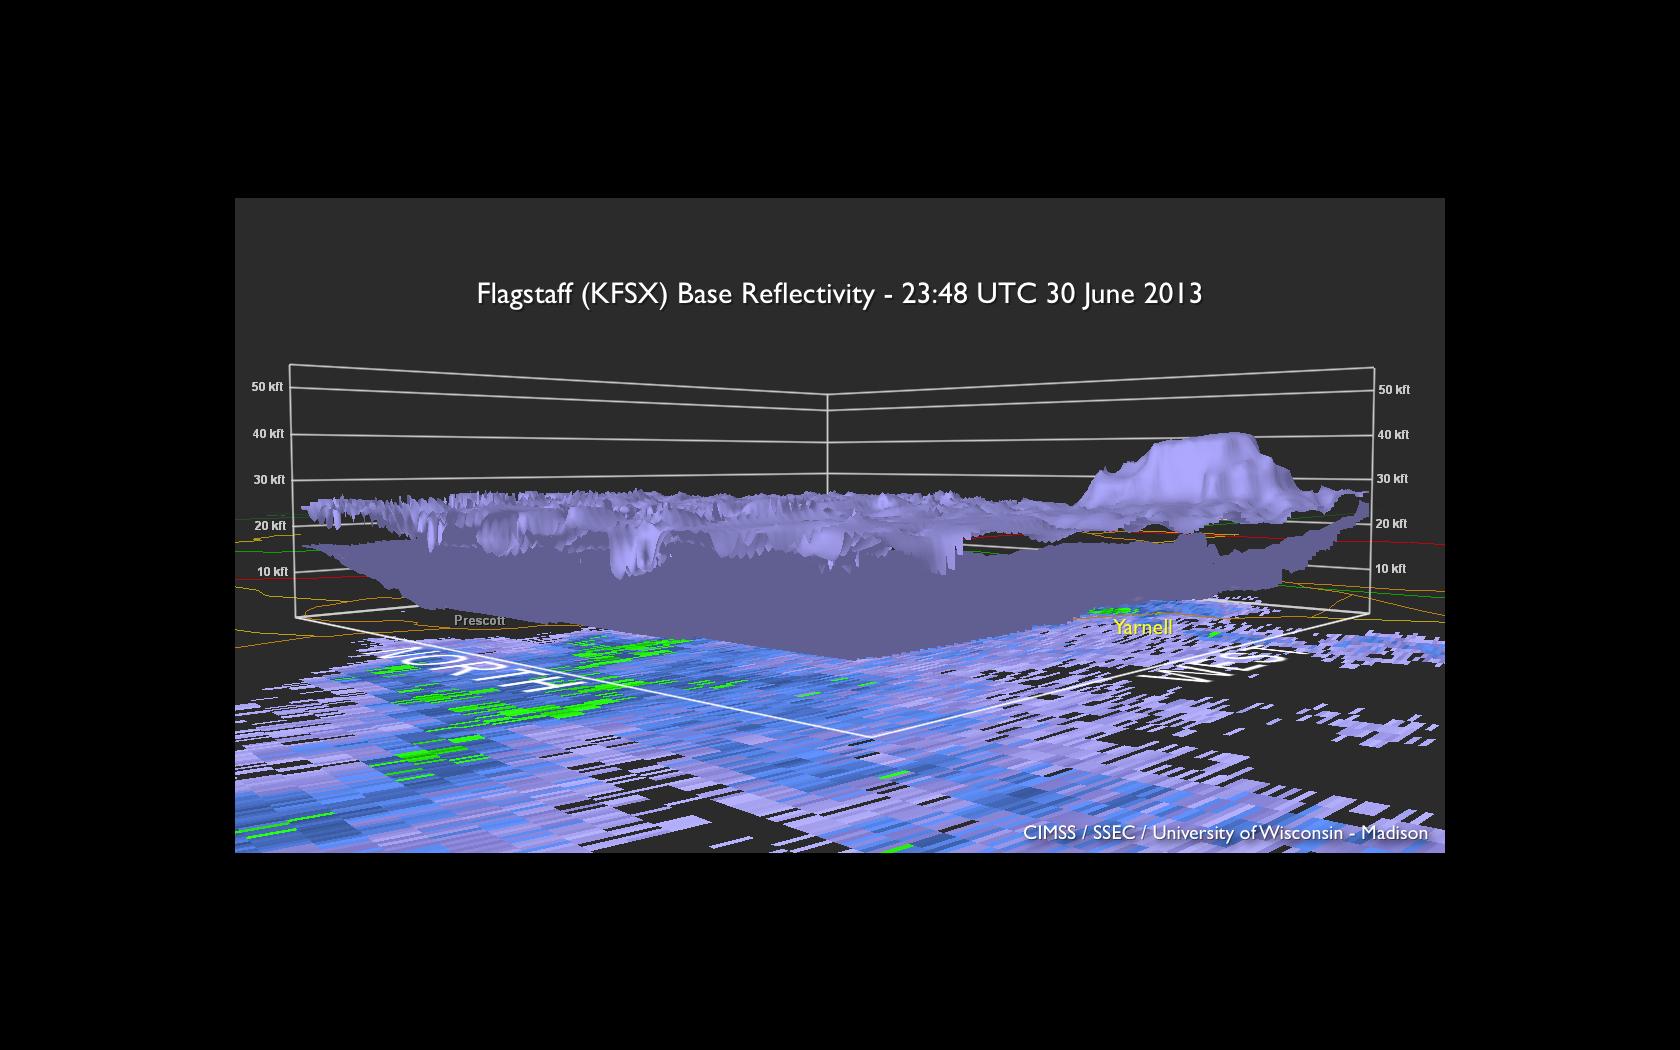 Flagstaff, Arizona WSR-88D radar base reflectivity and volume of 13.5 dBZ reflectivity isosurface (click image to play animation)